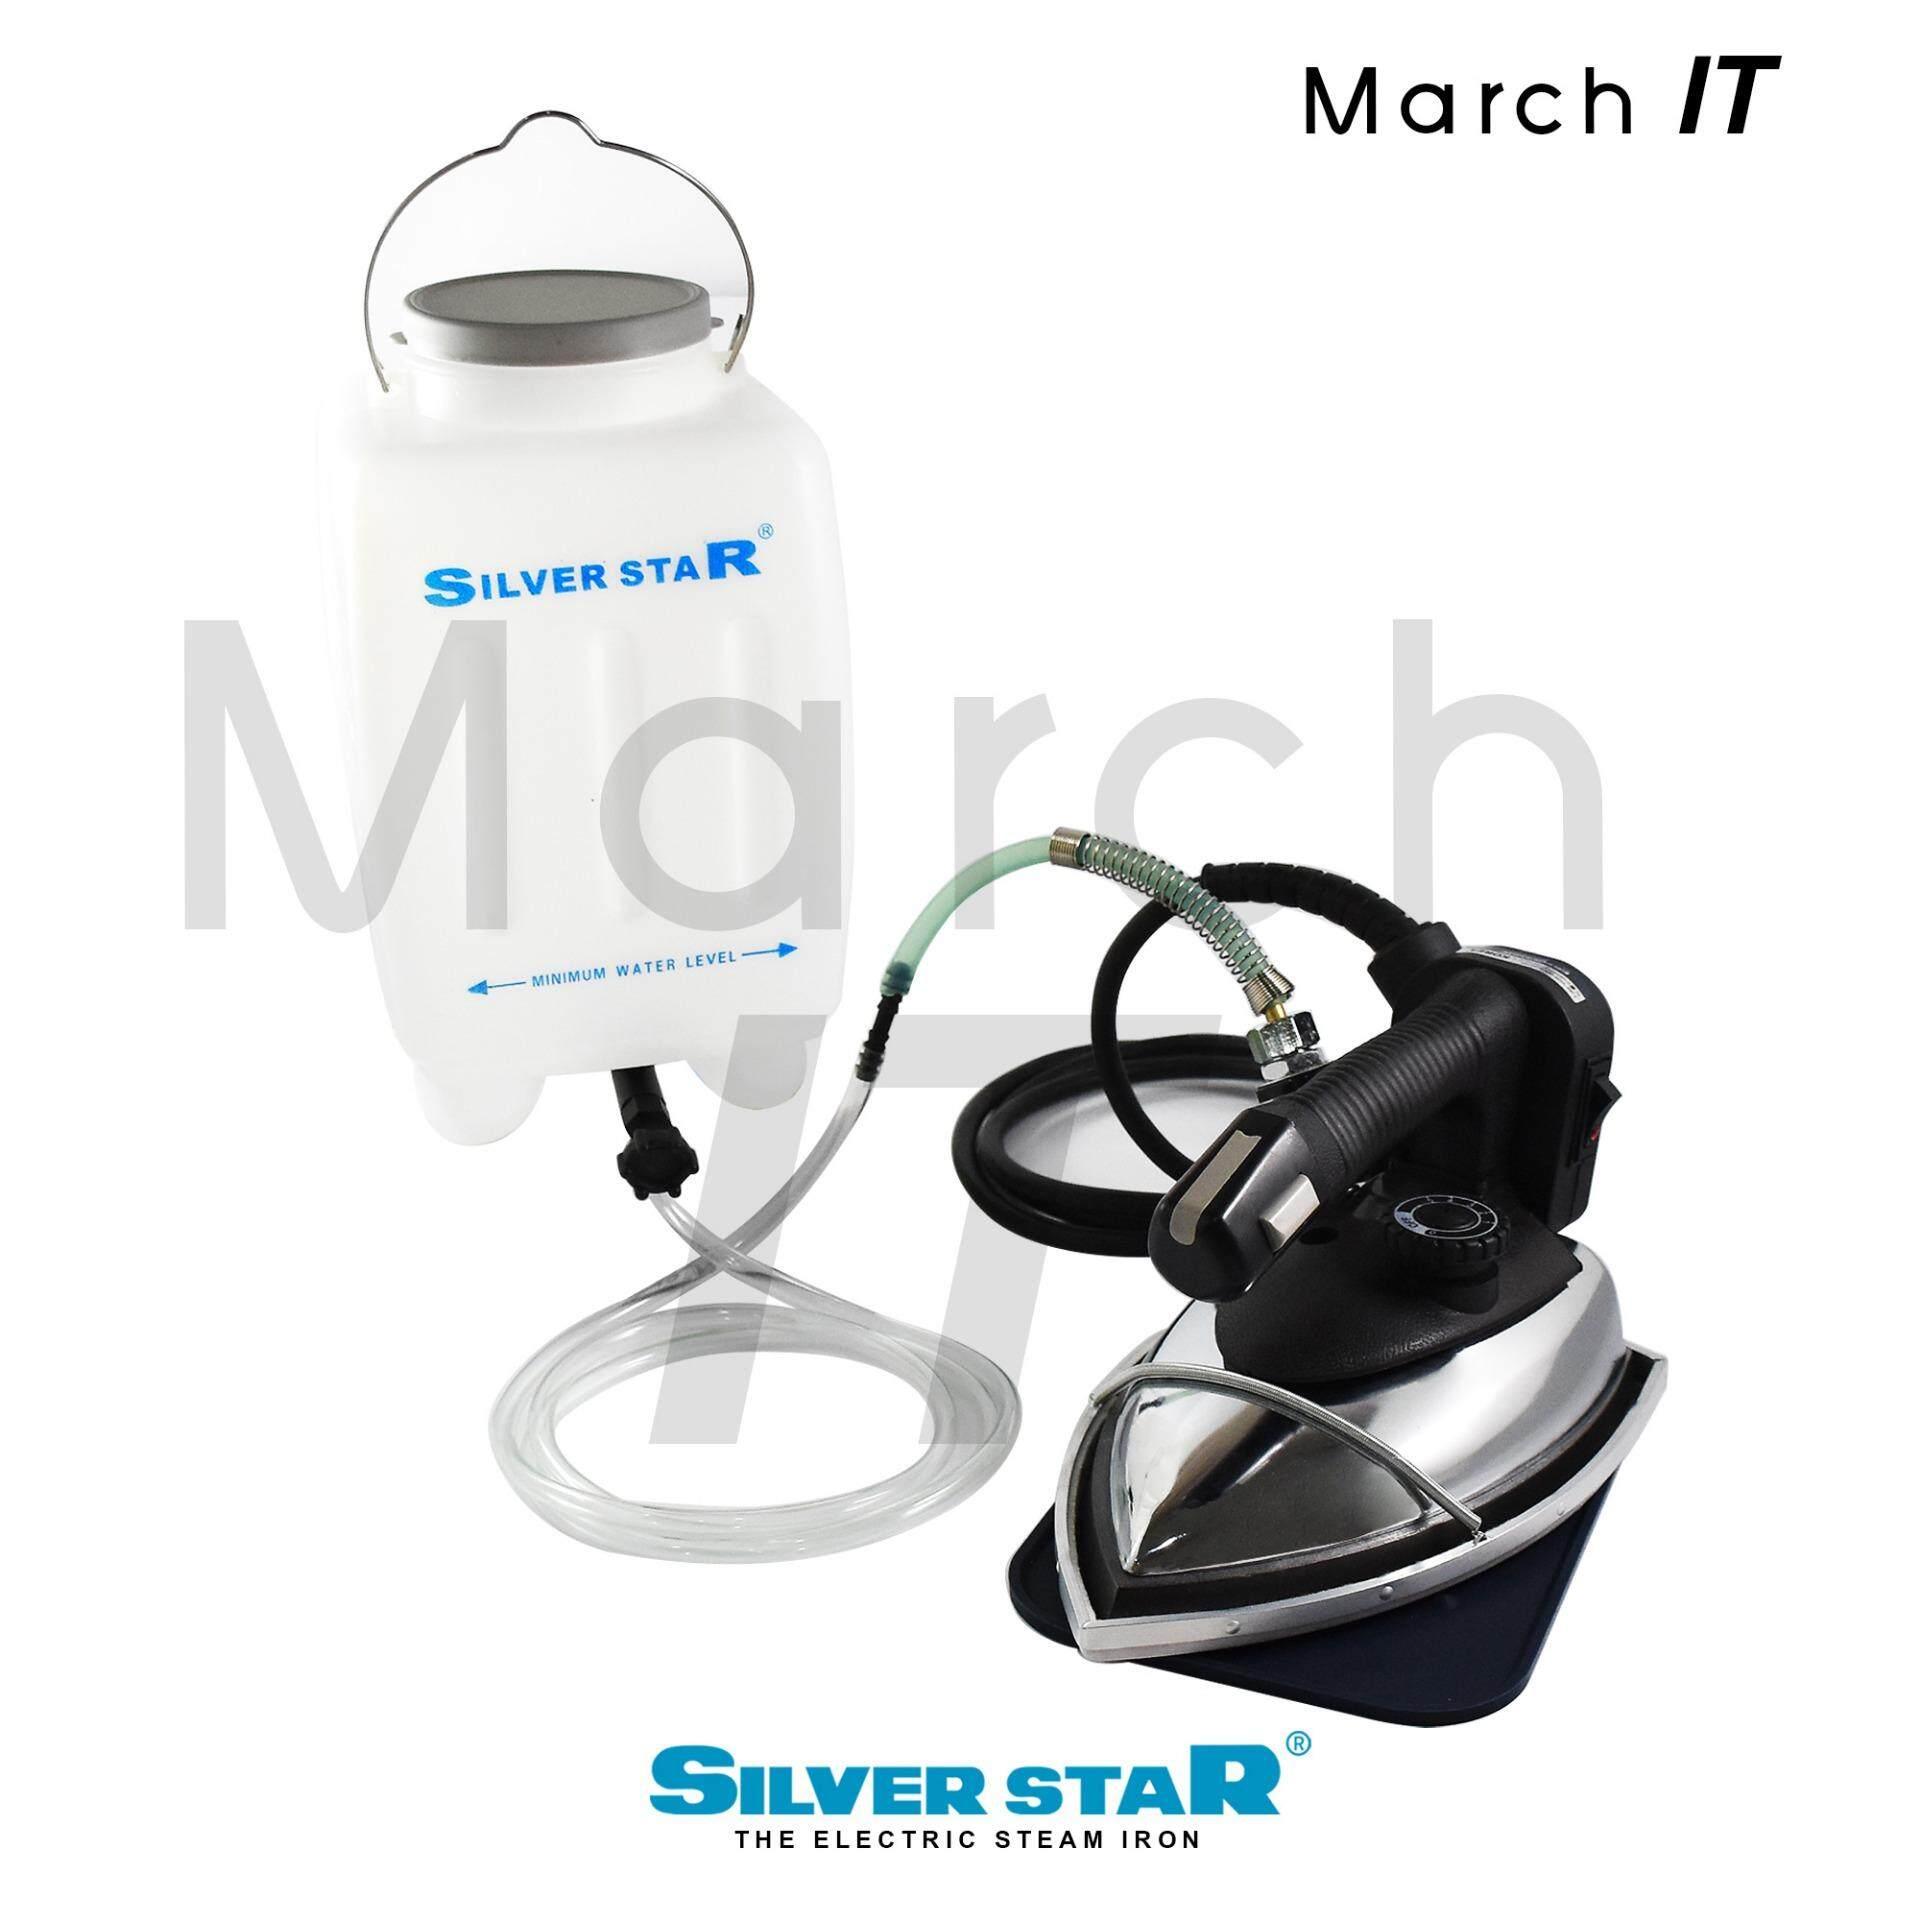 "SILVER STAR เตารีดไอน้ำ กระปุกน้ำเกลือ ""หน้าใหญ่"" เตารีดน้ำเกลือ ขนาด 227x138 มม. รุ่น ES-94AL แถมฟรี! แผ่นรองเตารีด"